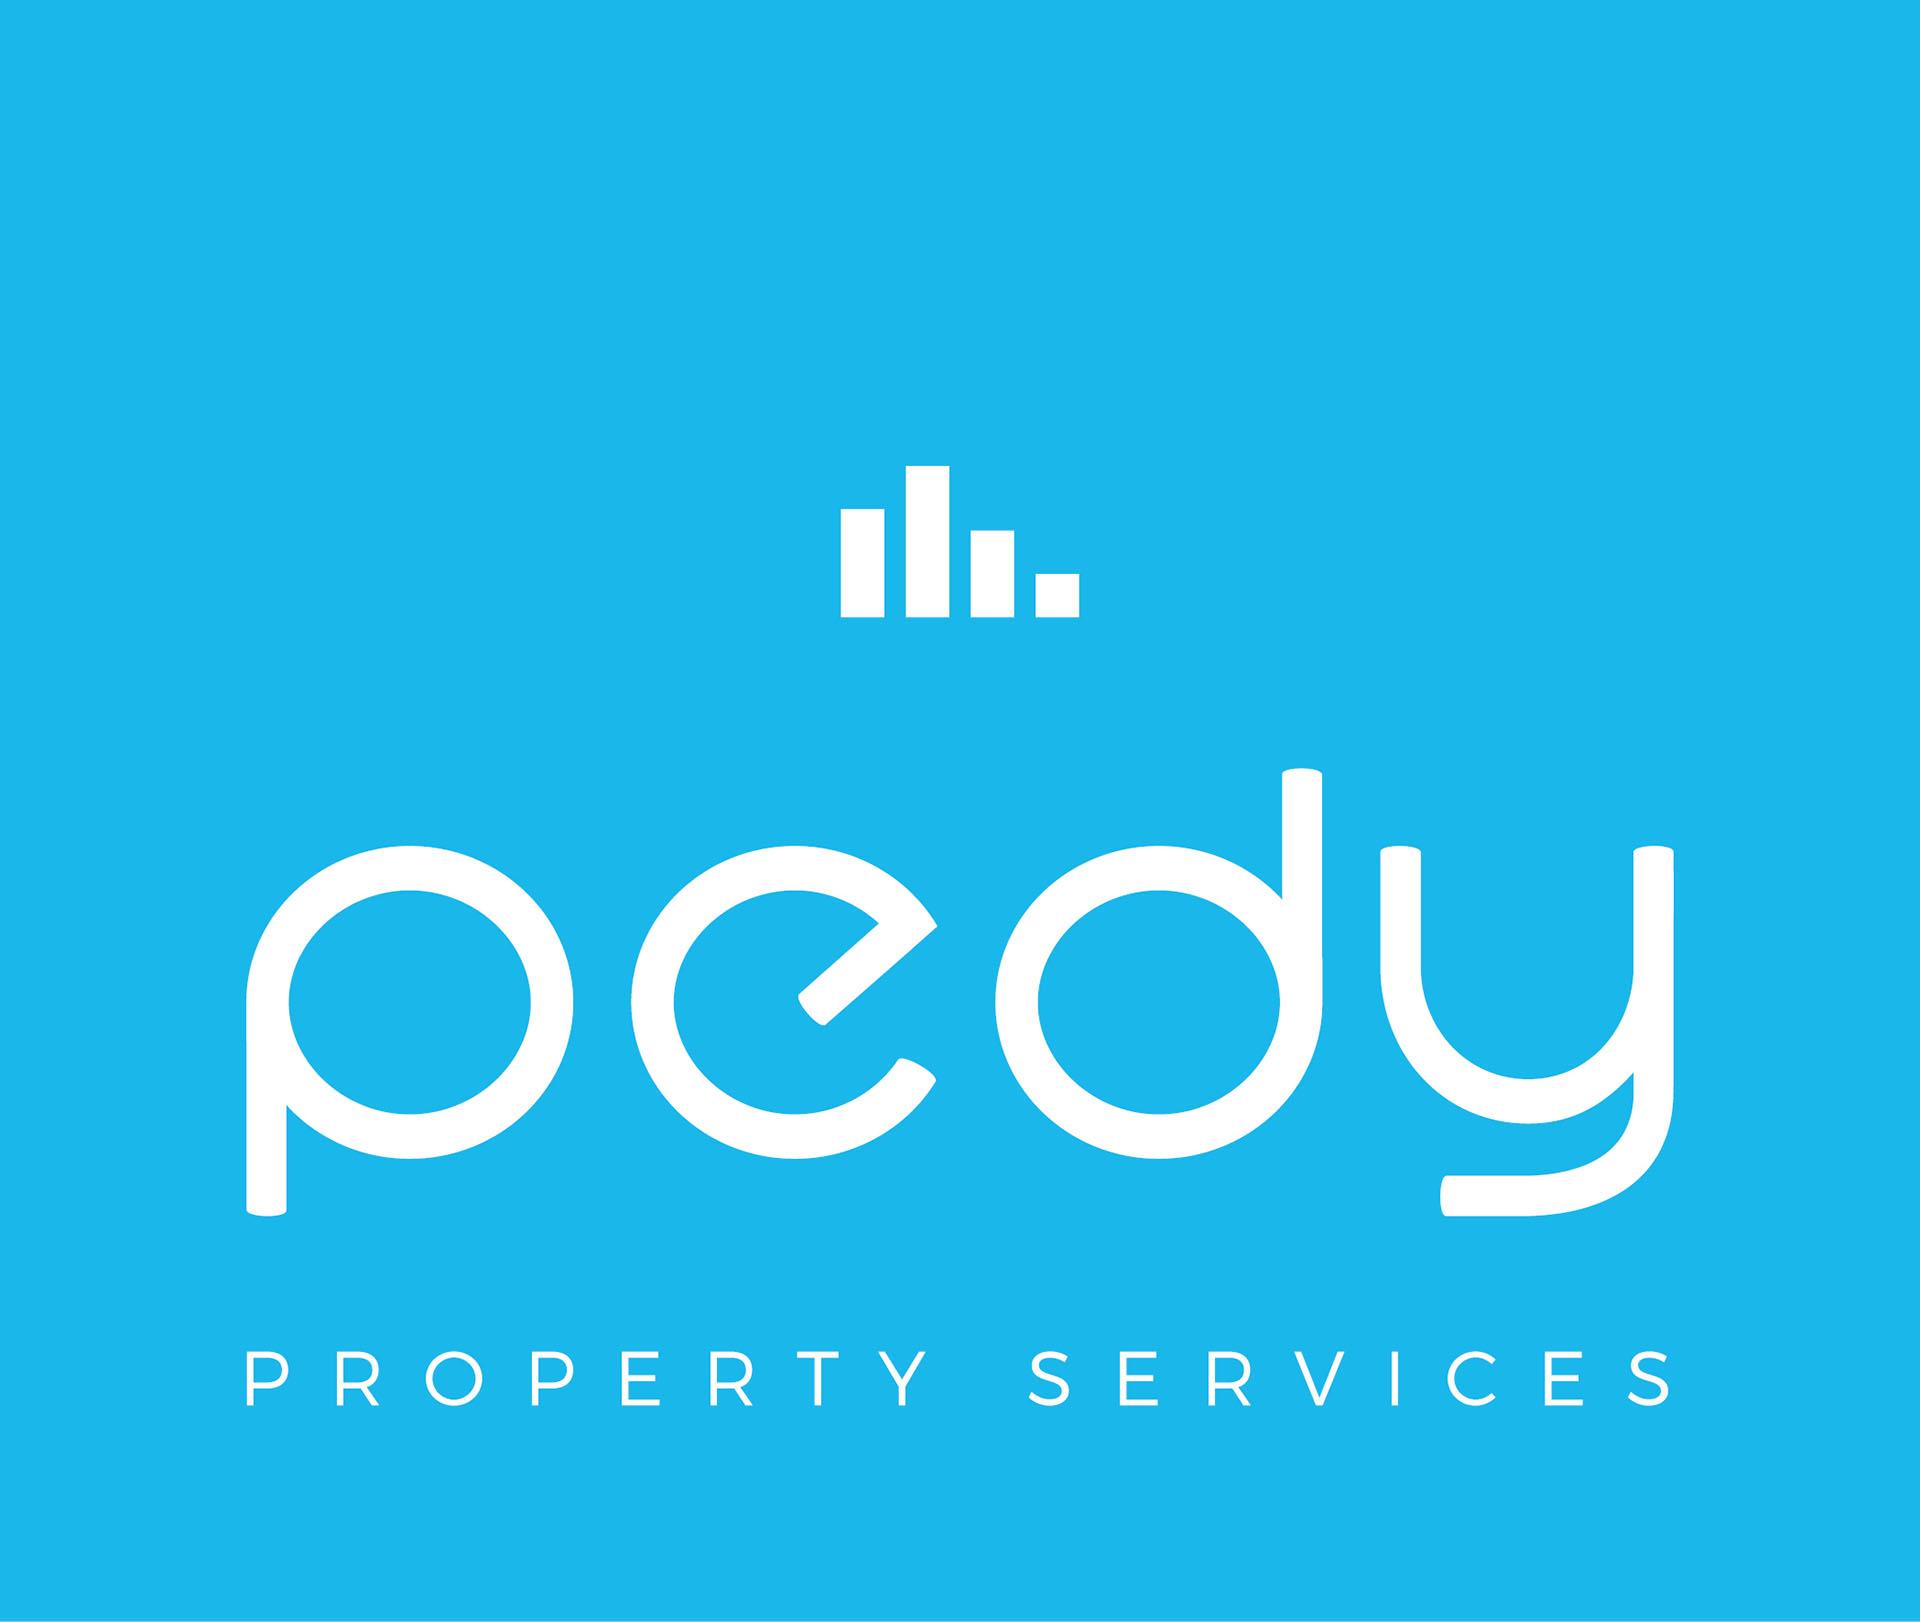 PEDY_JPG_BLUE